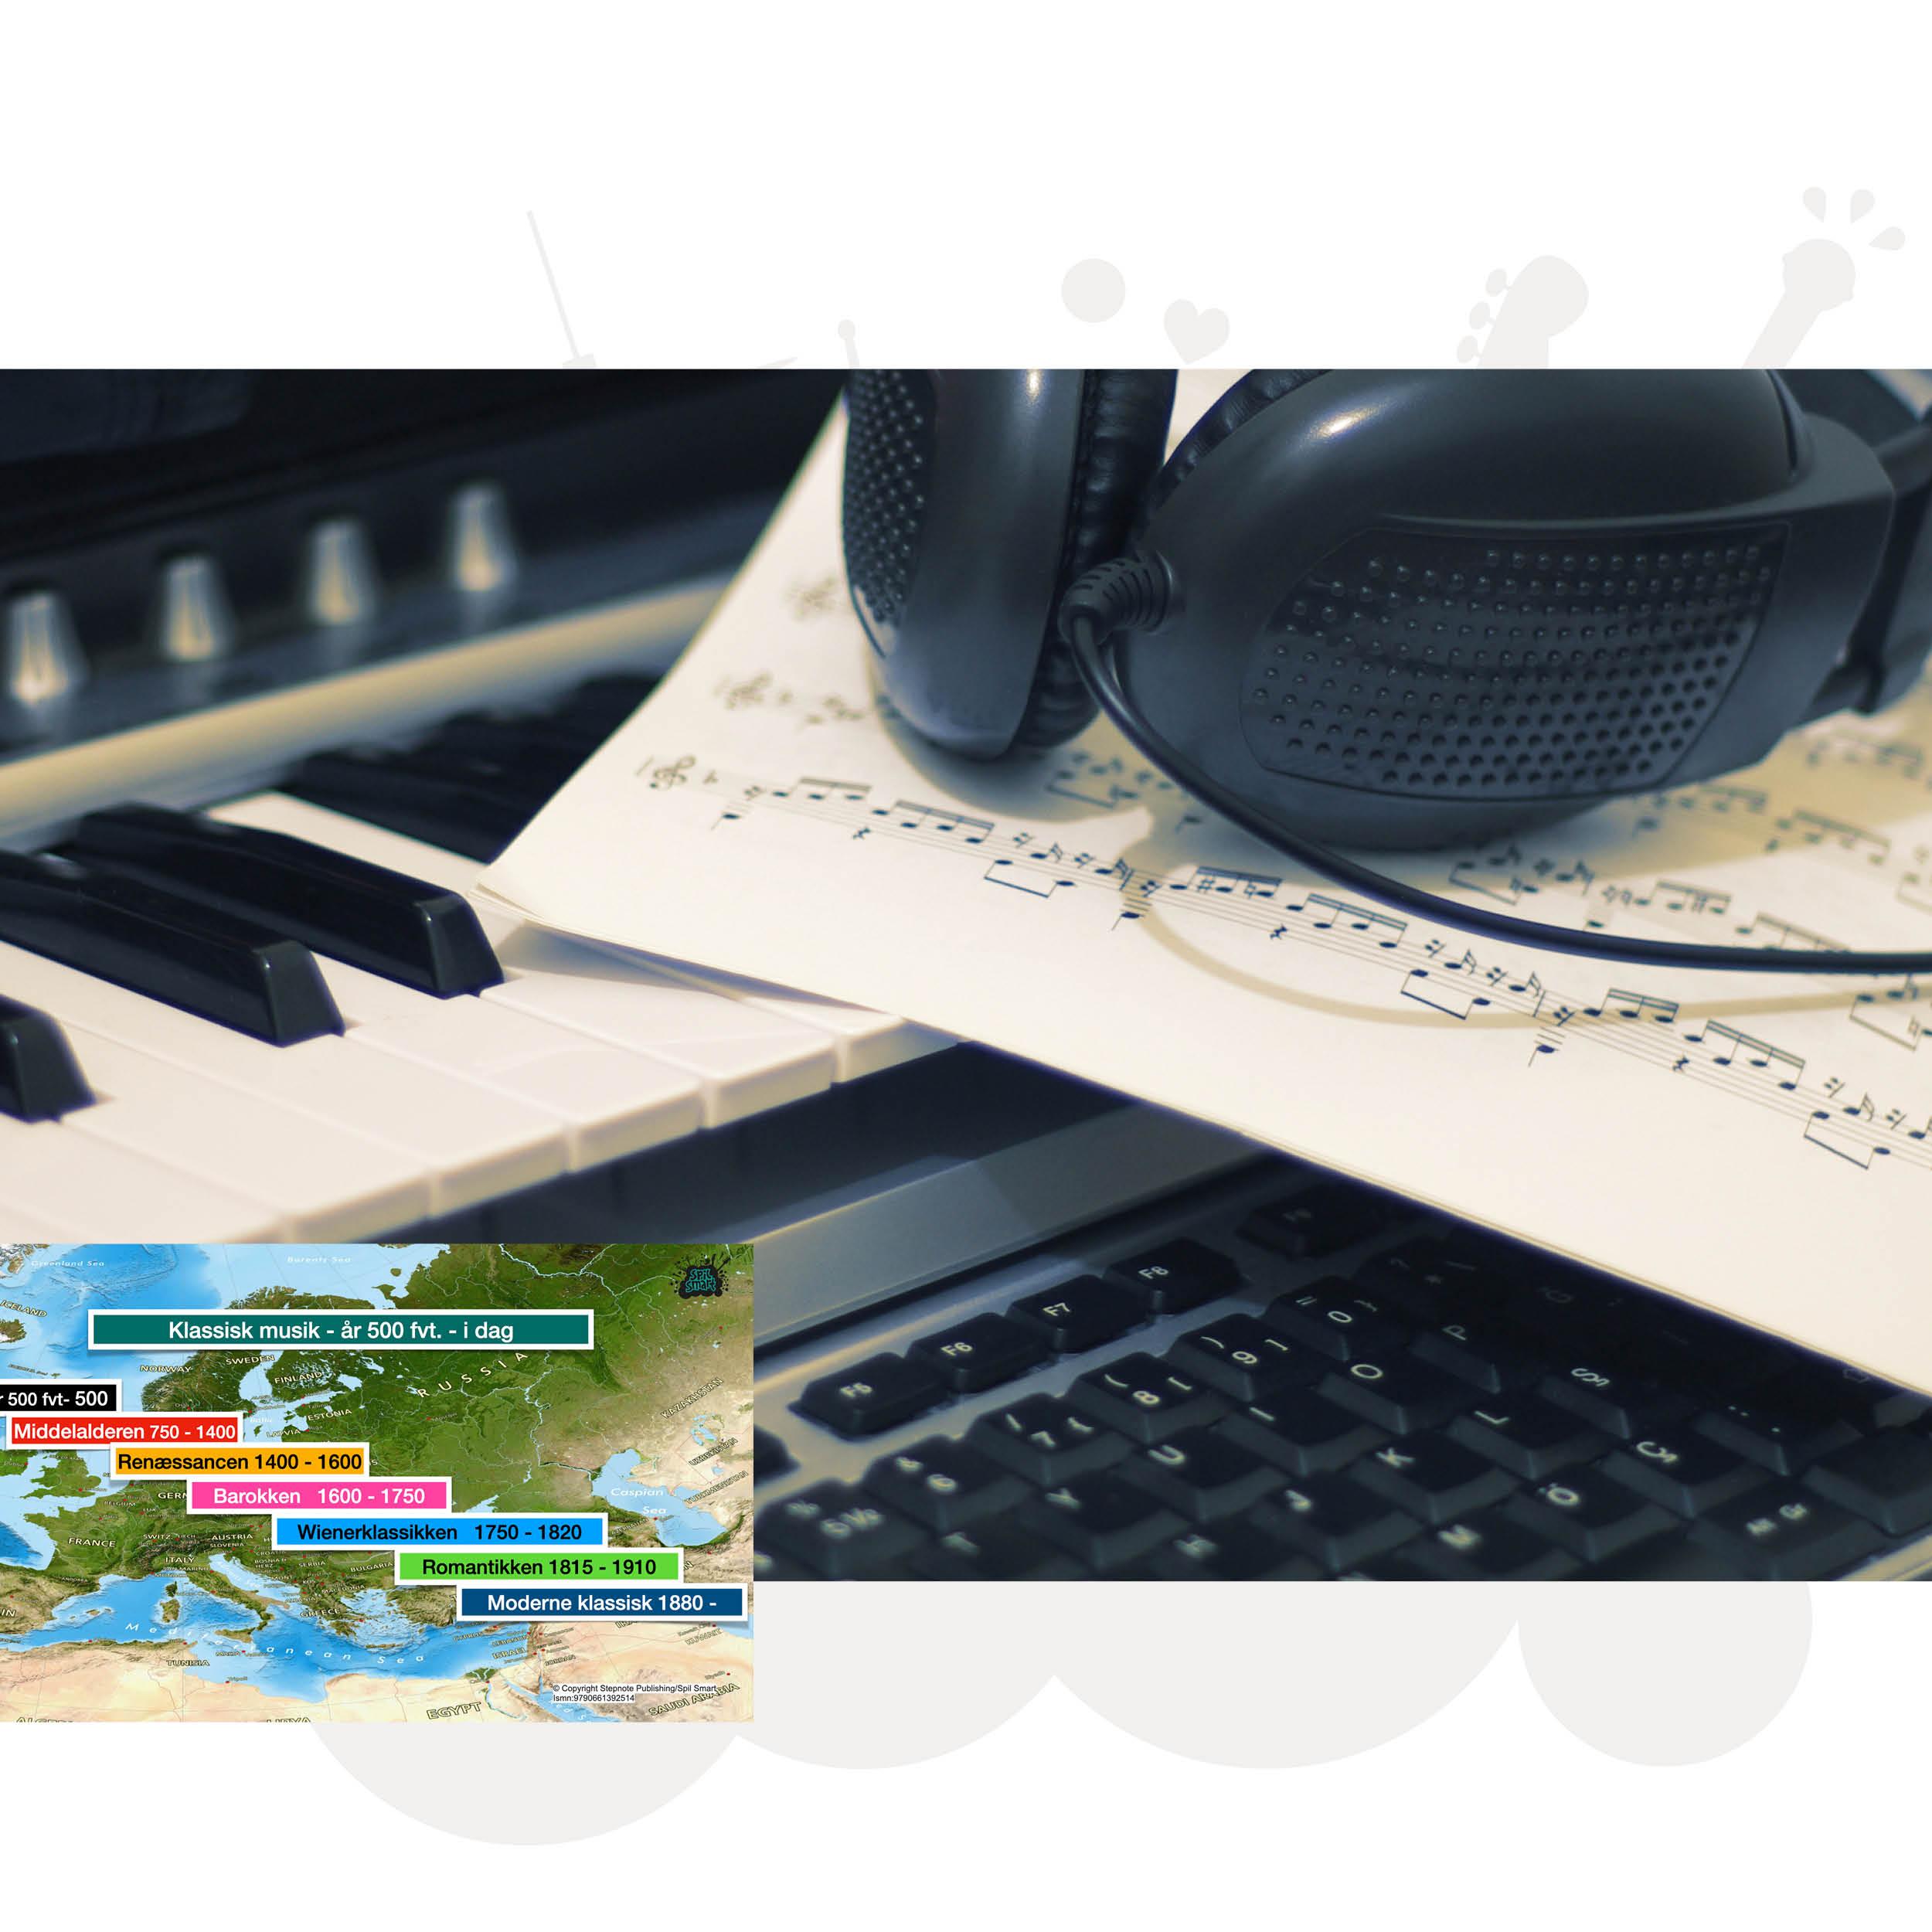 Formanalyse - Rundt om klassisk musik